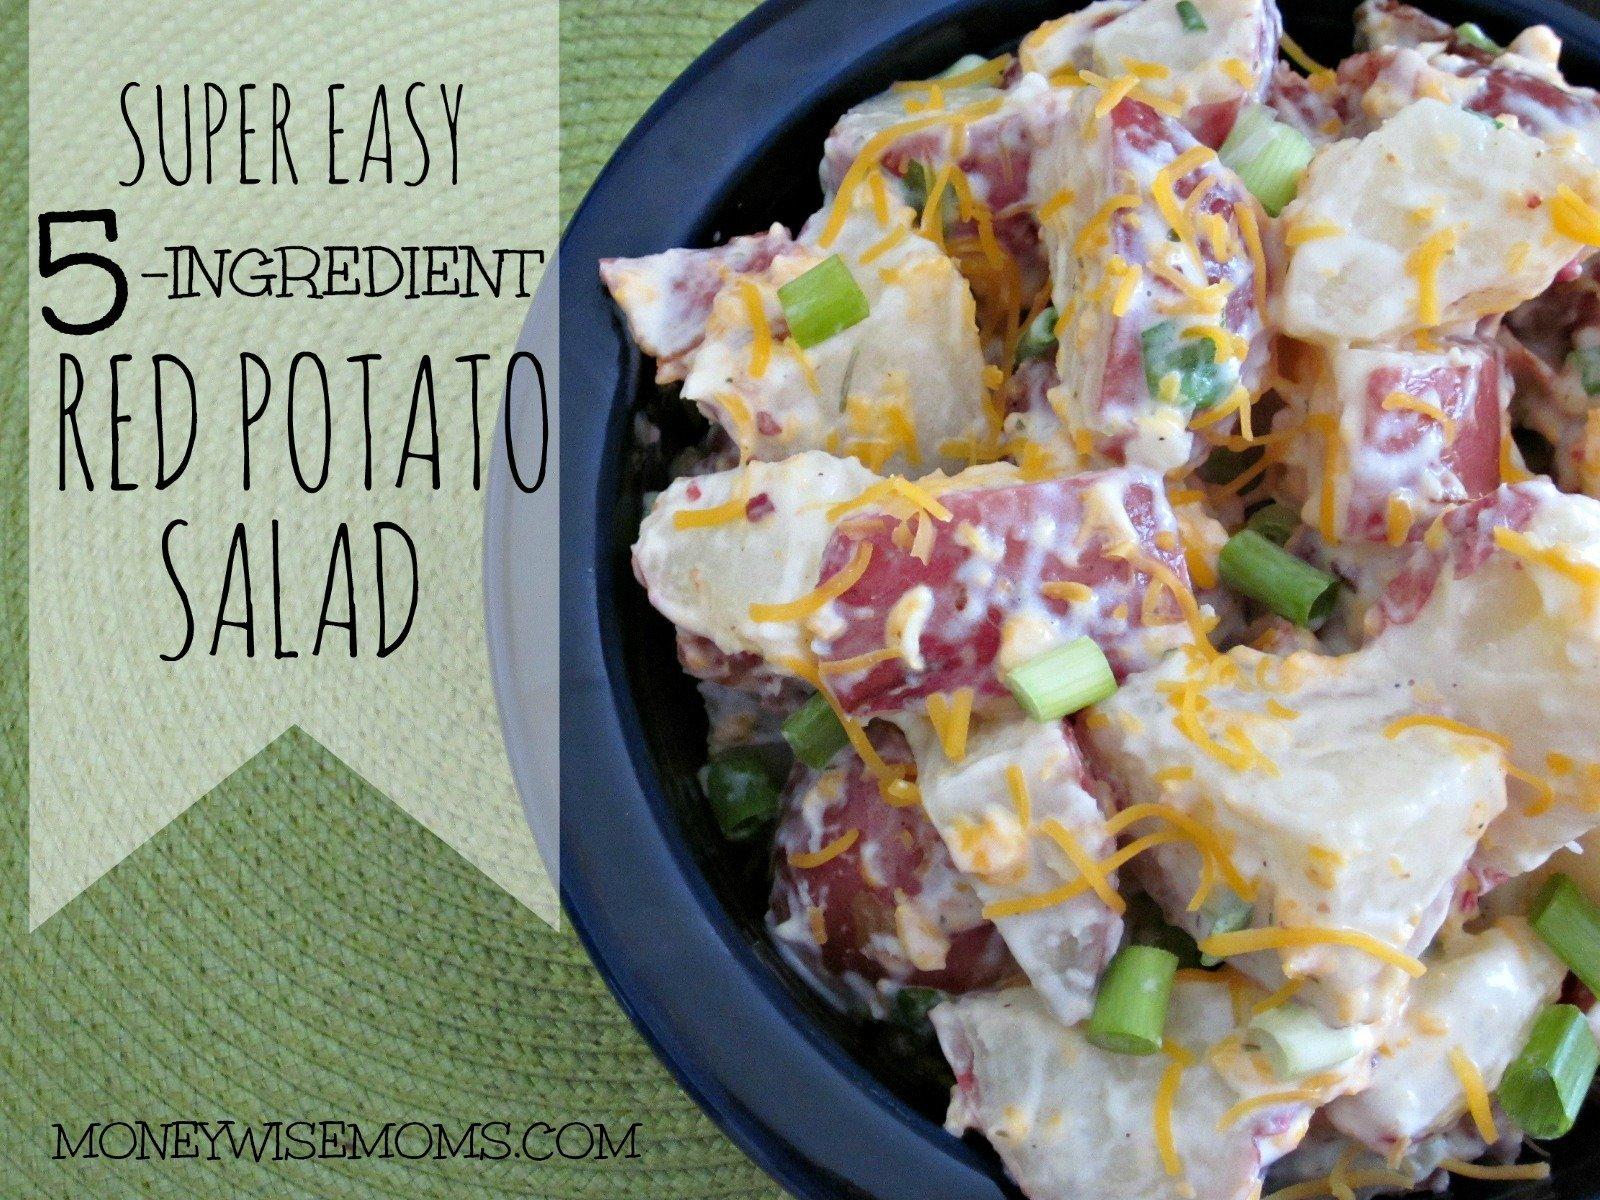 Super Easy Red Potato Salad #recipe that has just 5 ingredients | MoneywiseMoms